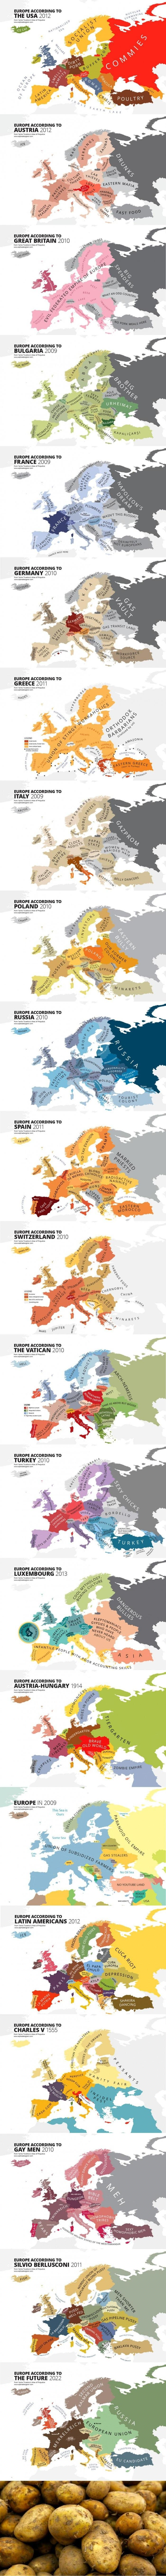 Views of Europe